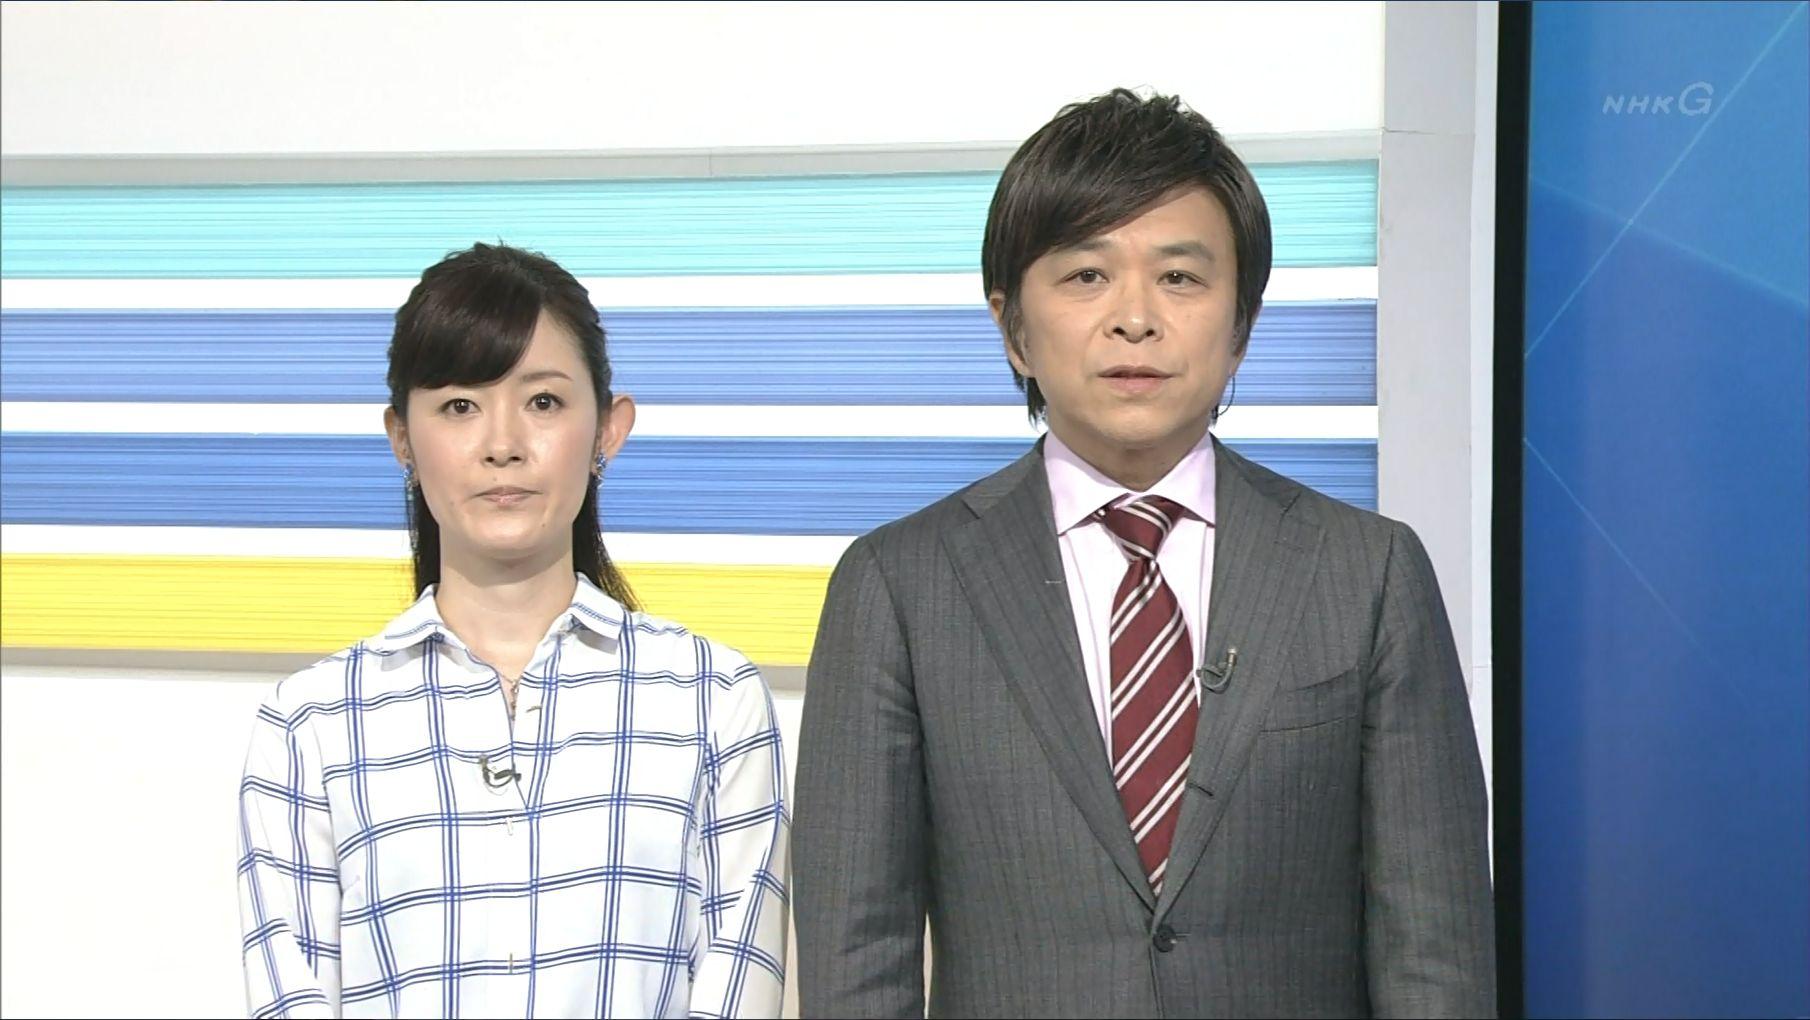 【N7SC】松村正代 Part3【17時のN/首都圏N845】©2ch.netfc2>1本 YouTube動画>8本 ->画像>240枚